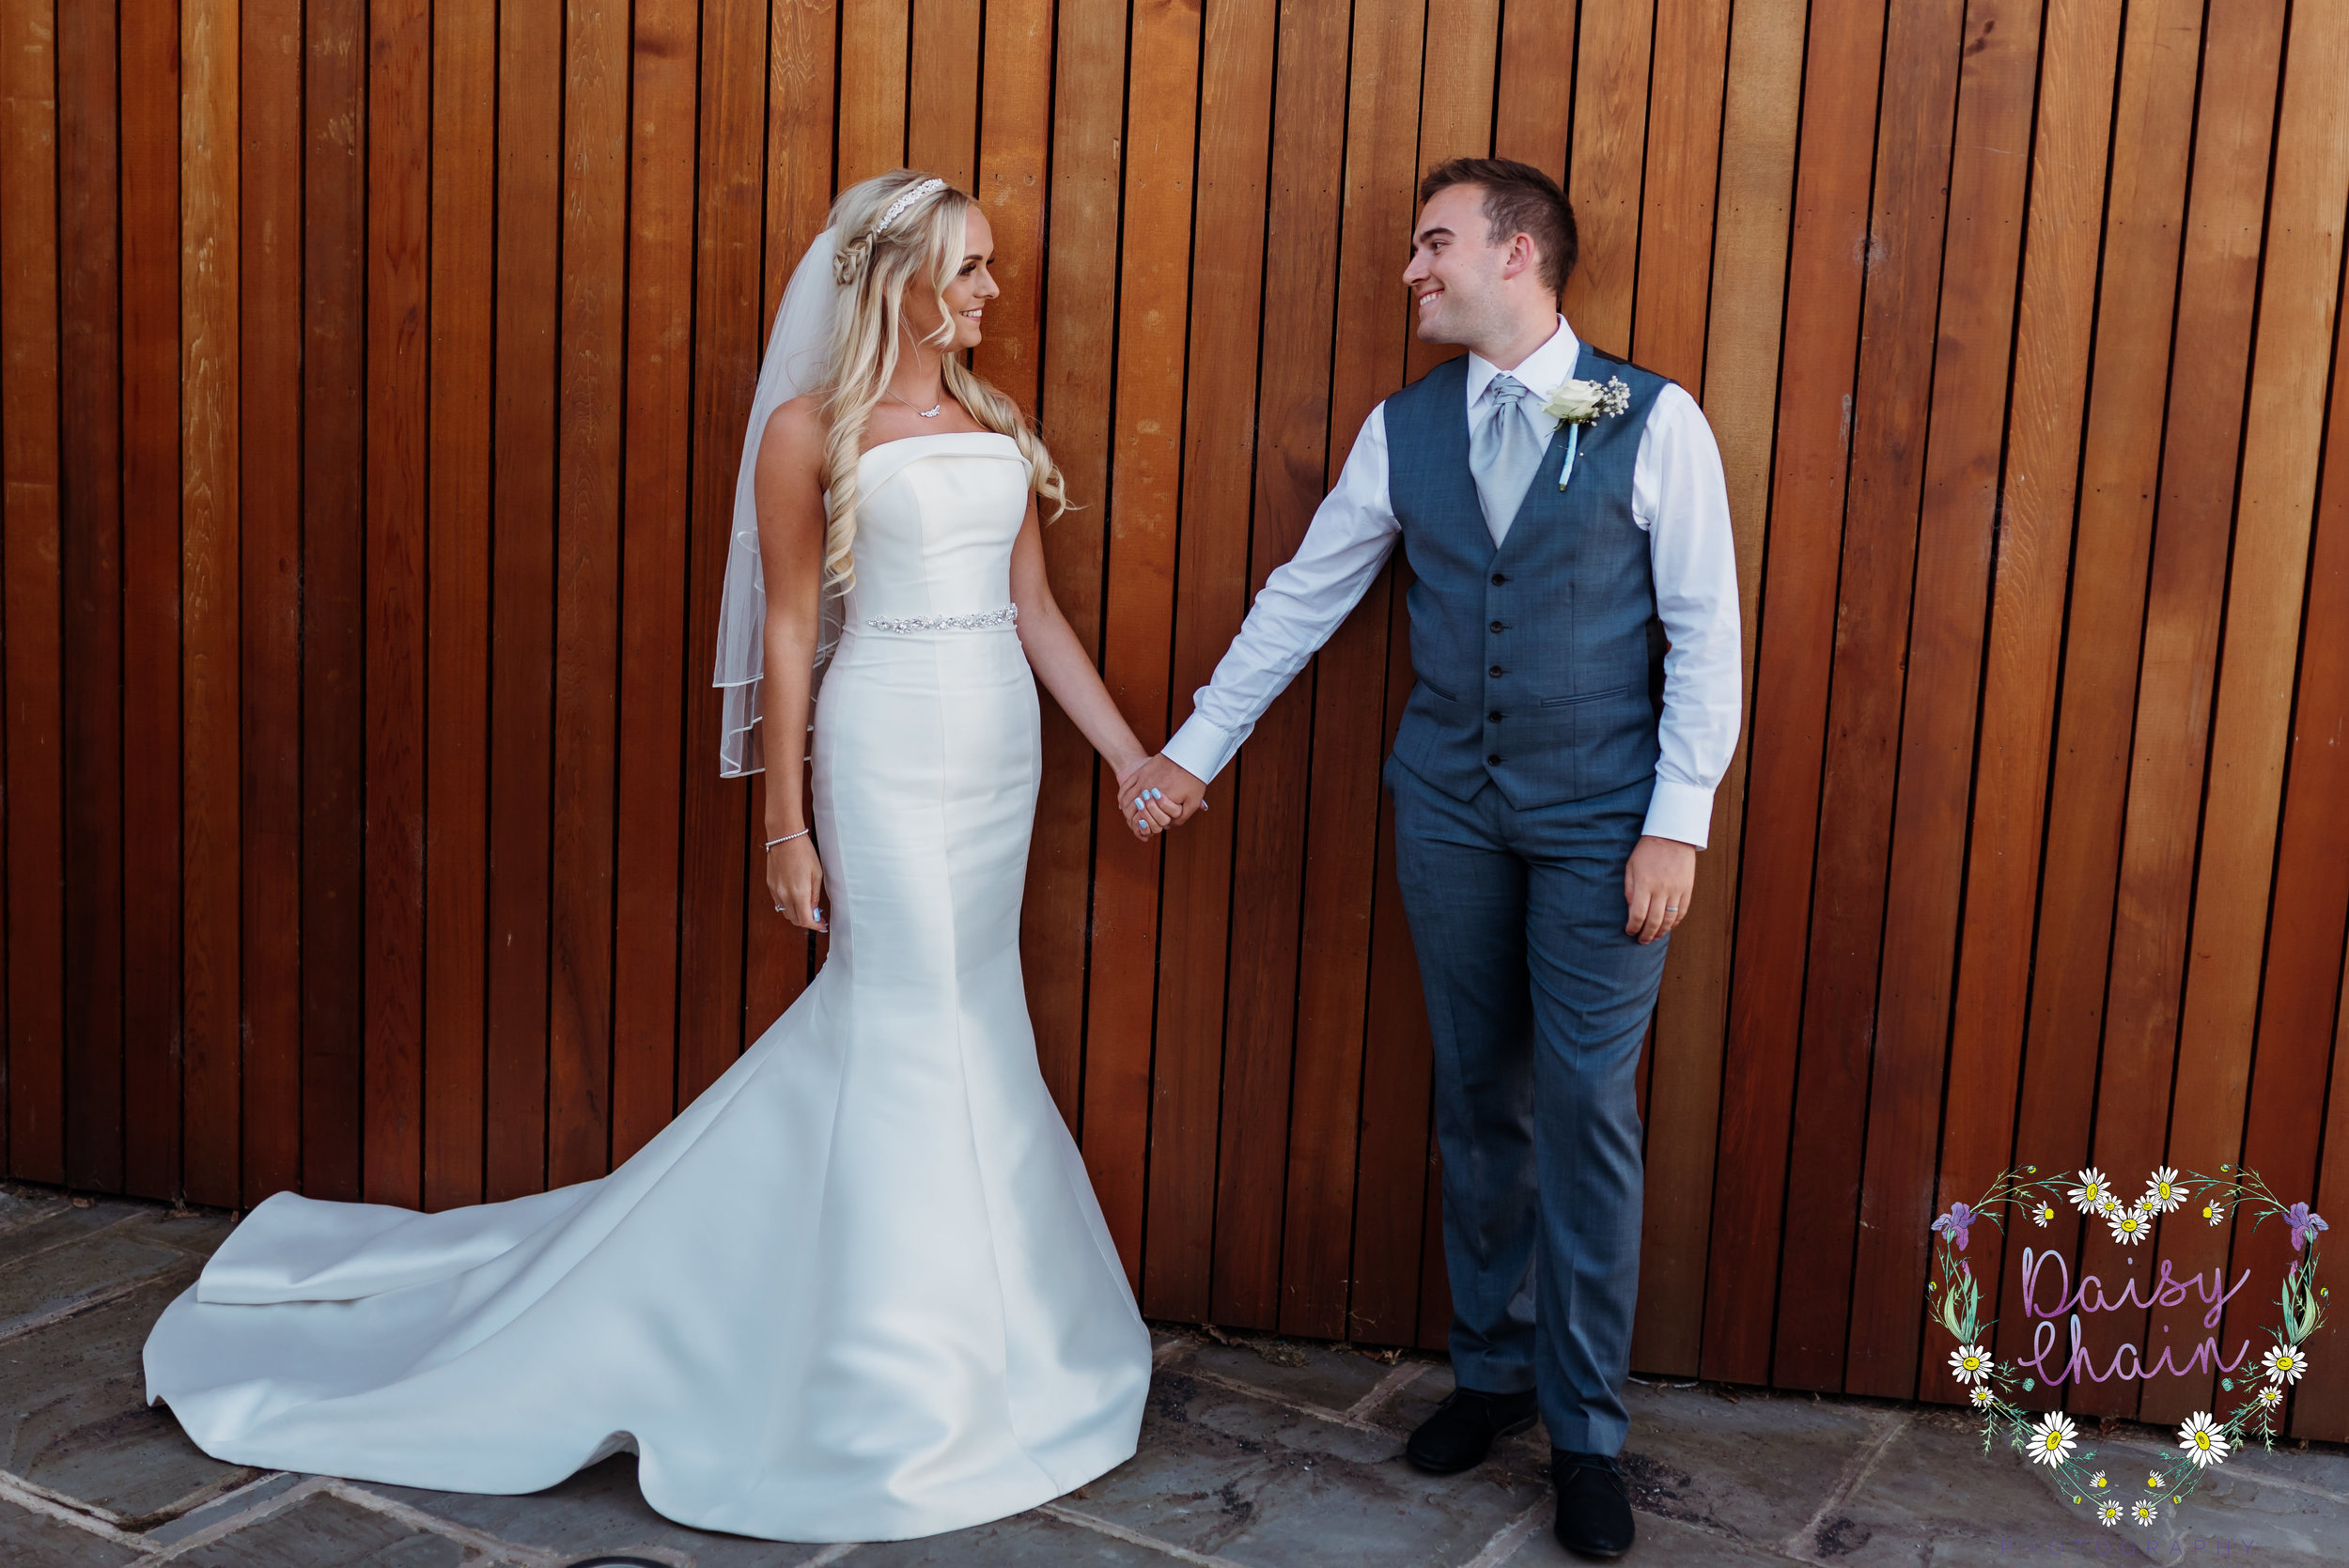 Summer wedding - Hurlston Hall